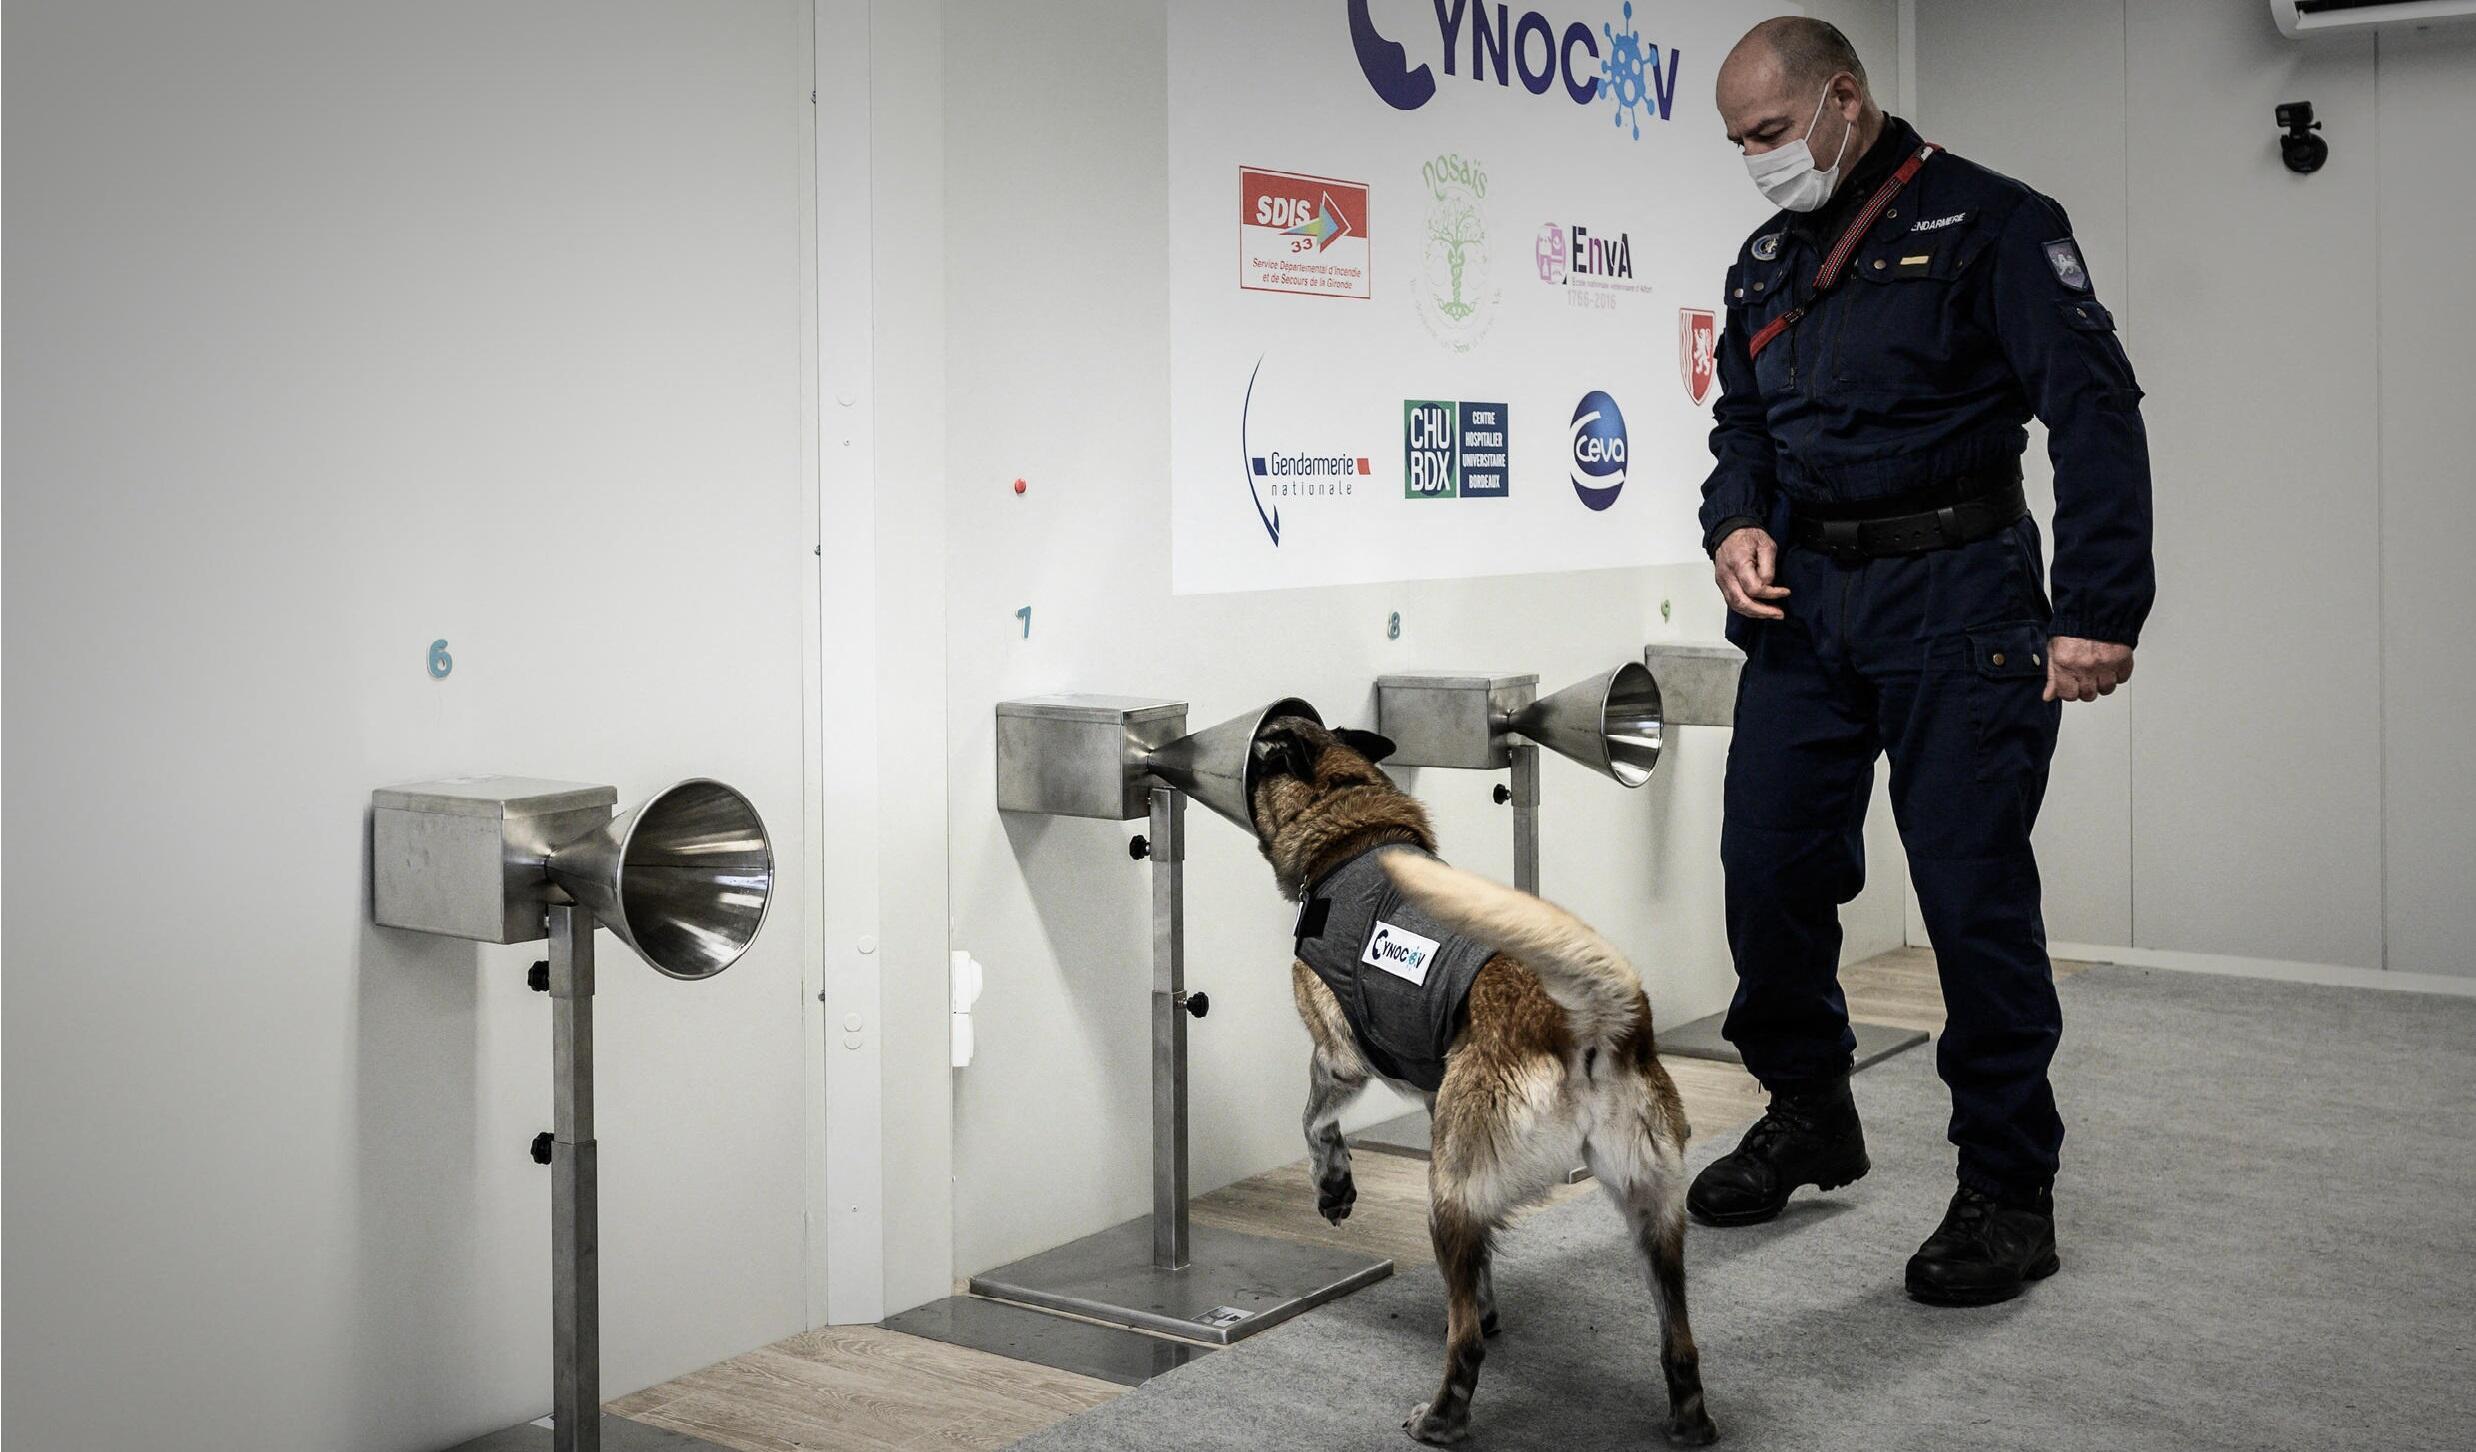 2021-02-18 france coronavirus covid-19 sniffer detector dogs